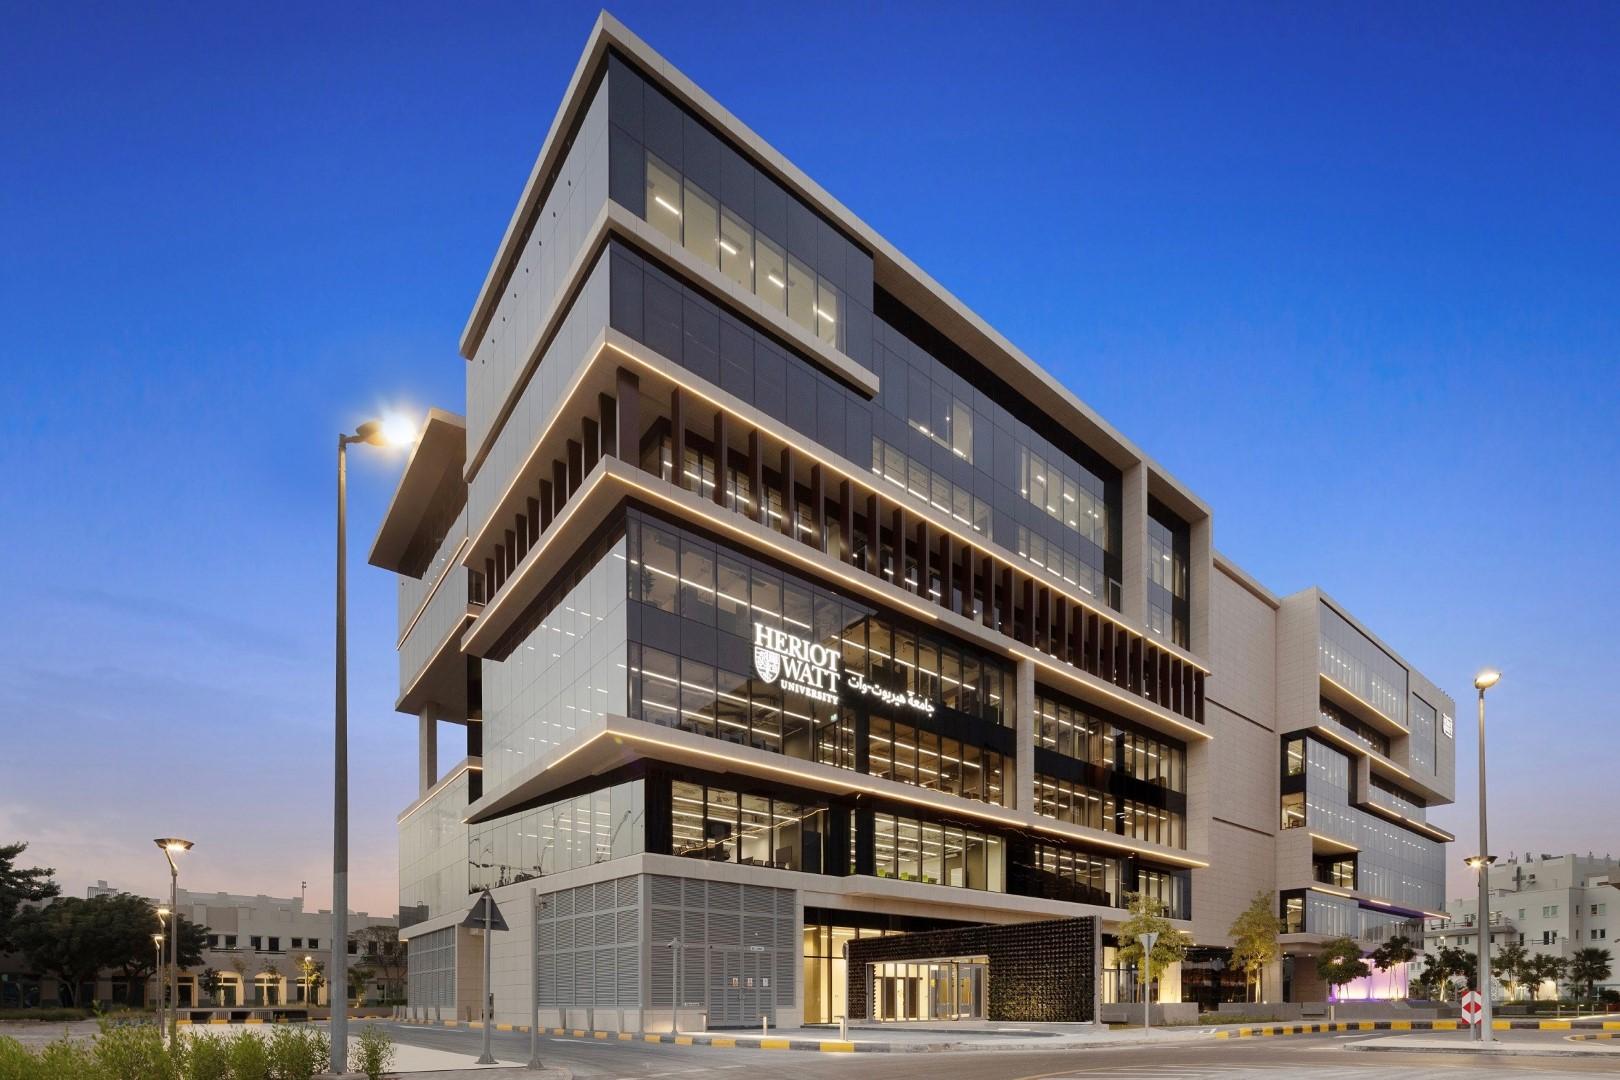 Heriot-Watt University Dubai moves to new digitally enabled campus at Dubai Knowledge Park